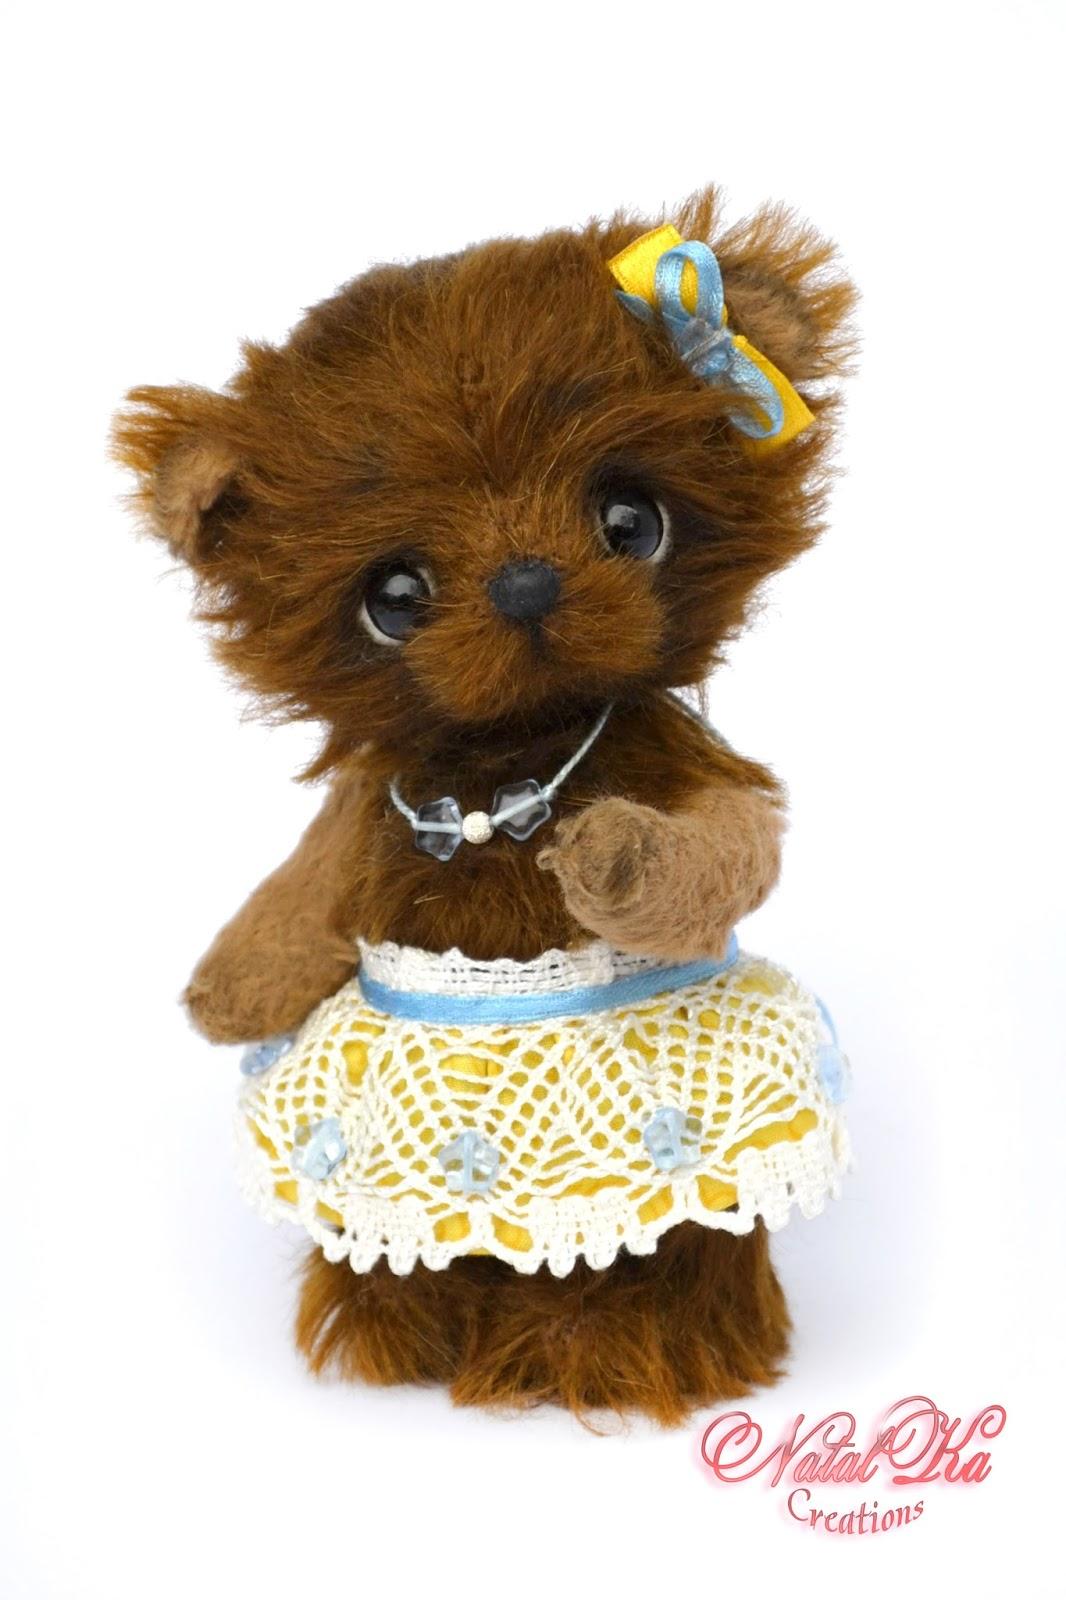 Artist teddy bear, artist bear jointed, teddy bear handmade, ooak, Künstlerteddy, Künstlerbär, Teddybär, Teddy, Bär, авторский мишка тедди, медведь тедди, медвежонок тедди, ручная работа от NatalKa Creations